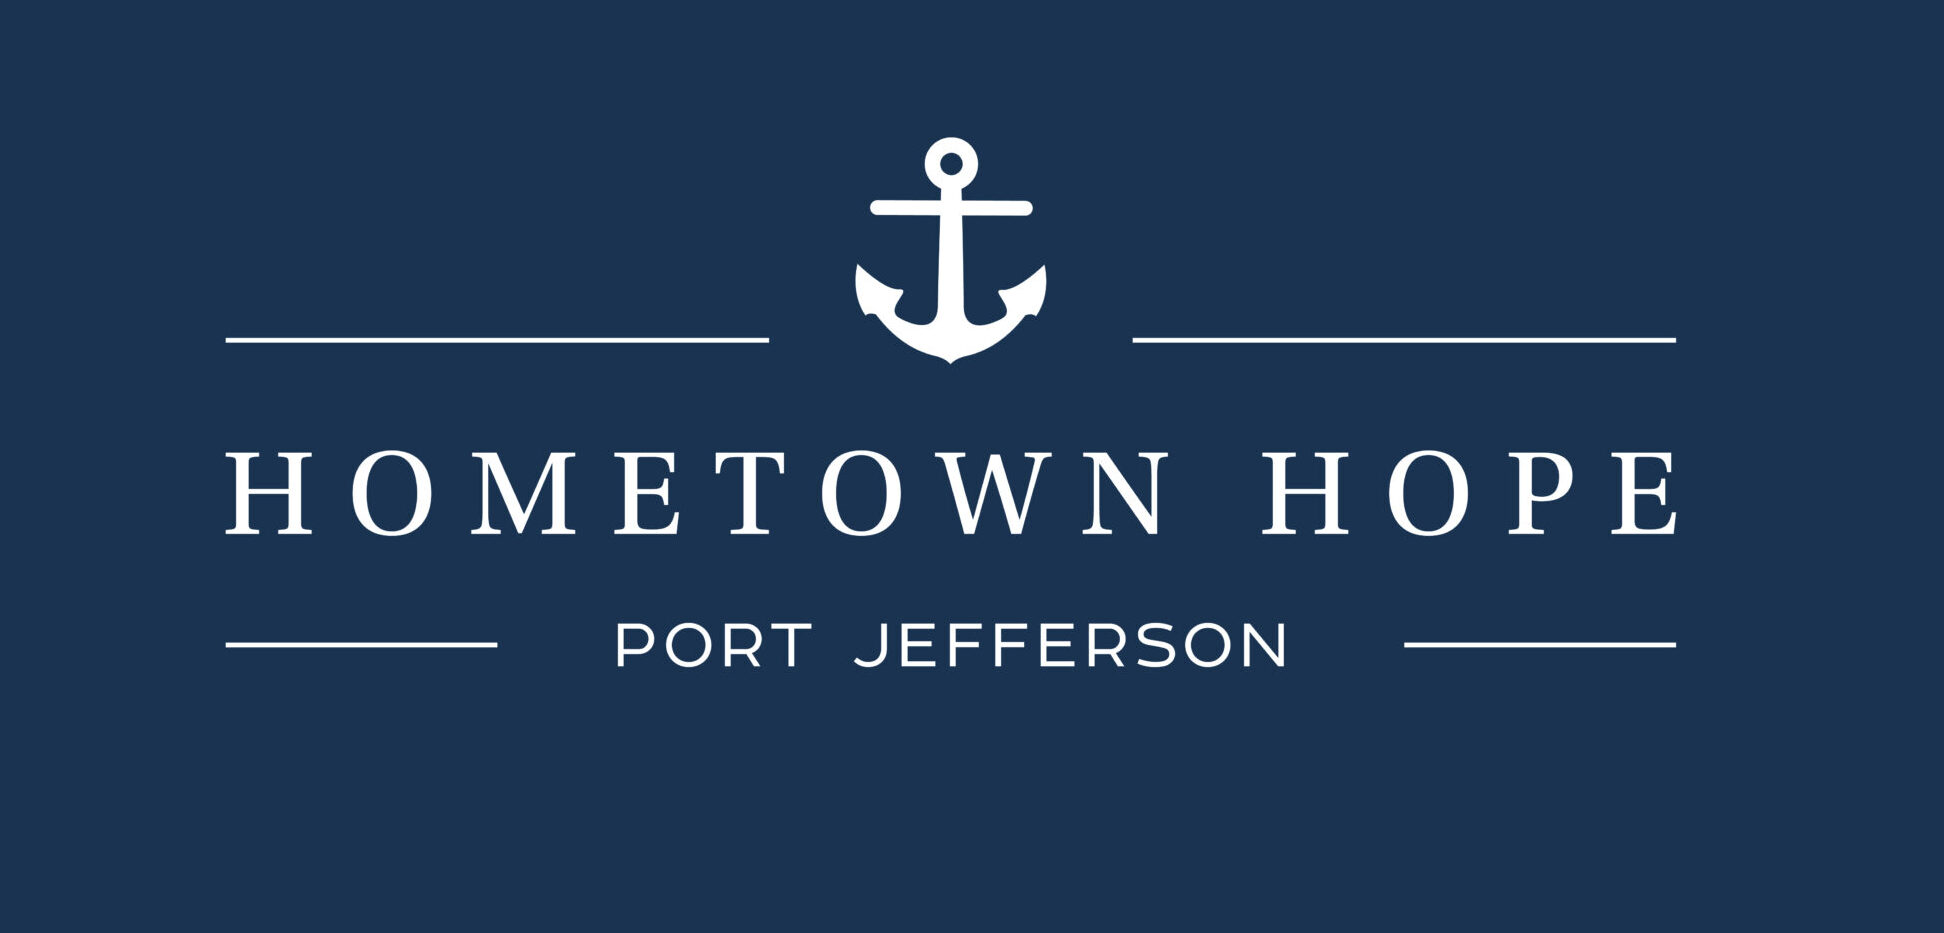 Hometown Hope Port Jefferson